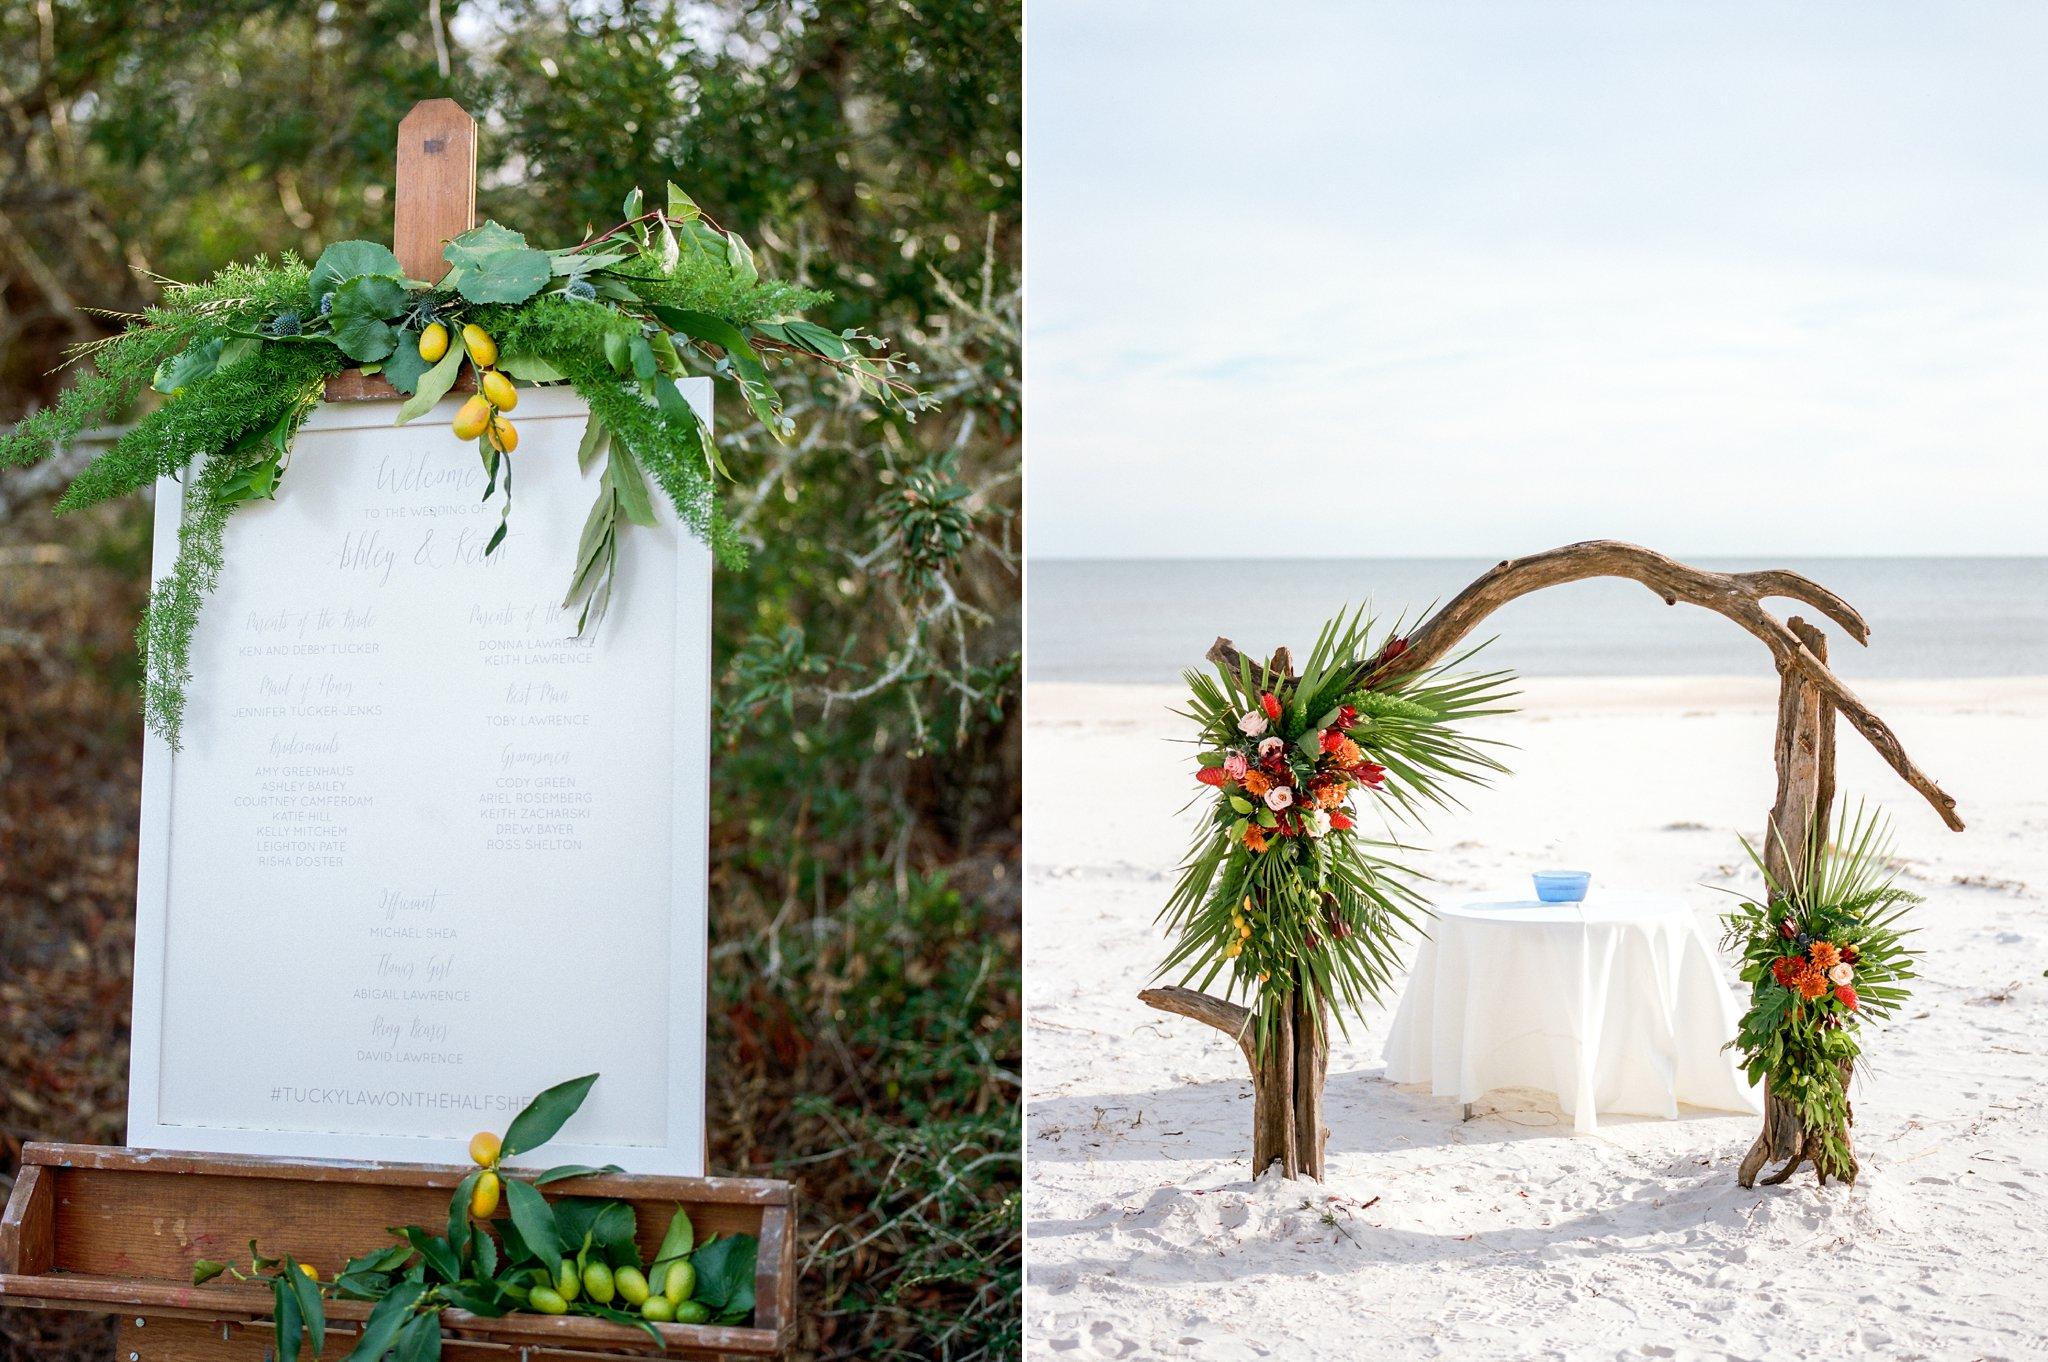 st+george+island+wedding+st+george+island+photographer+shannon+griffin+photography_0073.jpg